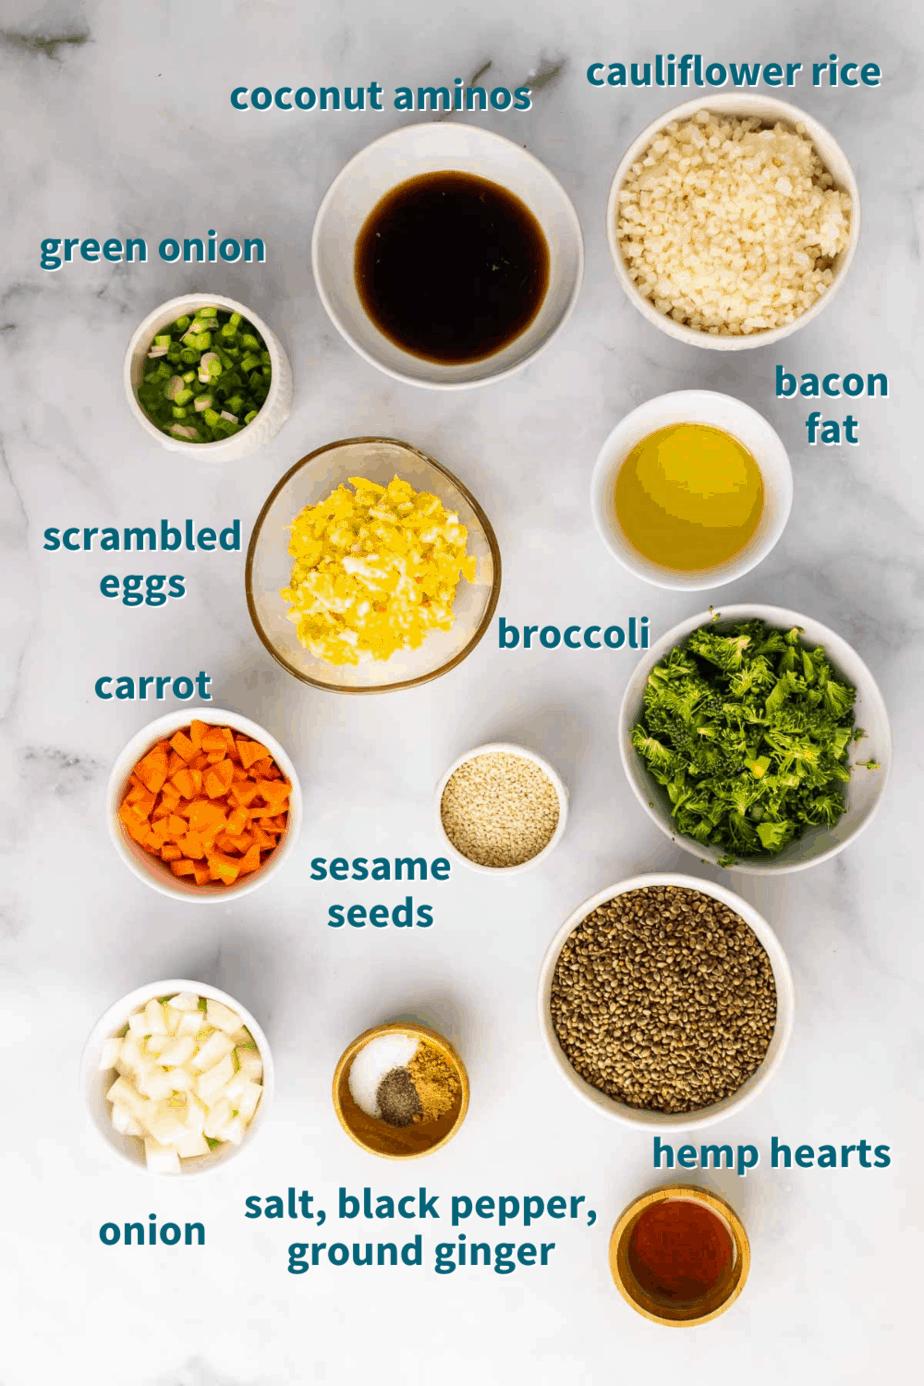 Ingredients for Crispy Sheet Pan Cauliflower Fried Rice